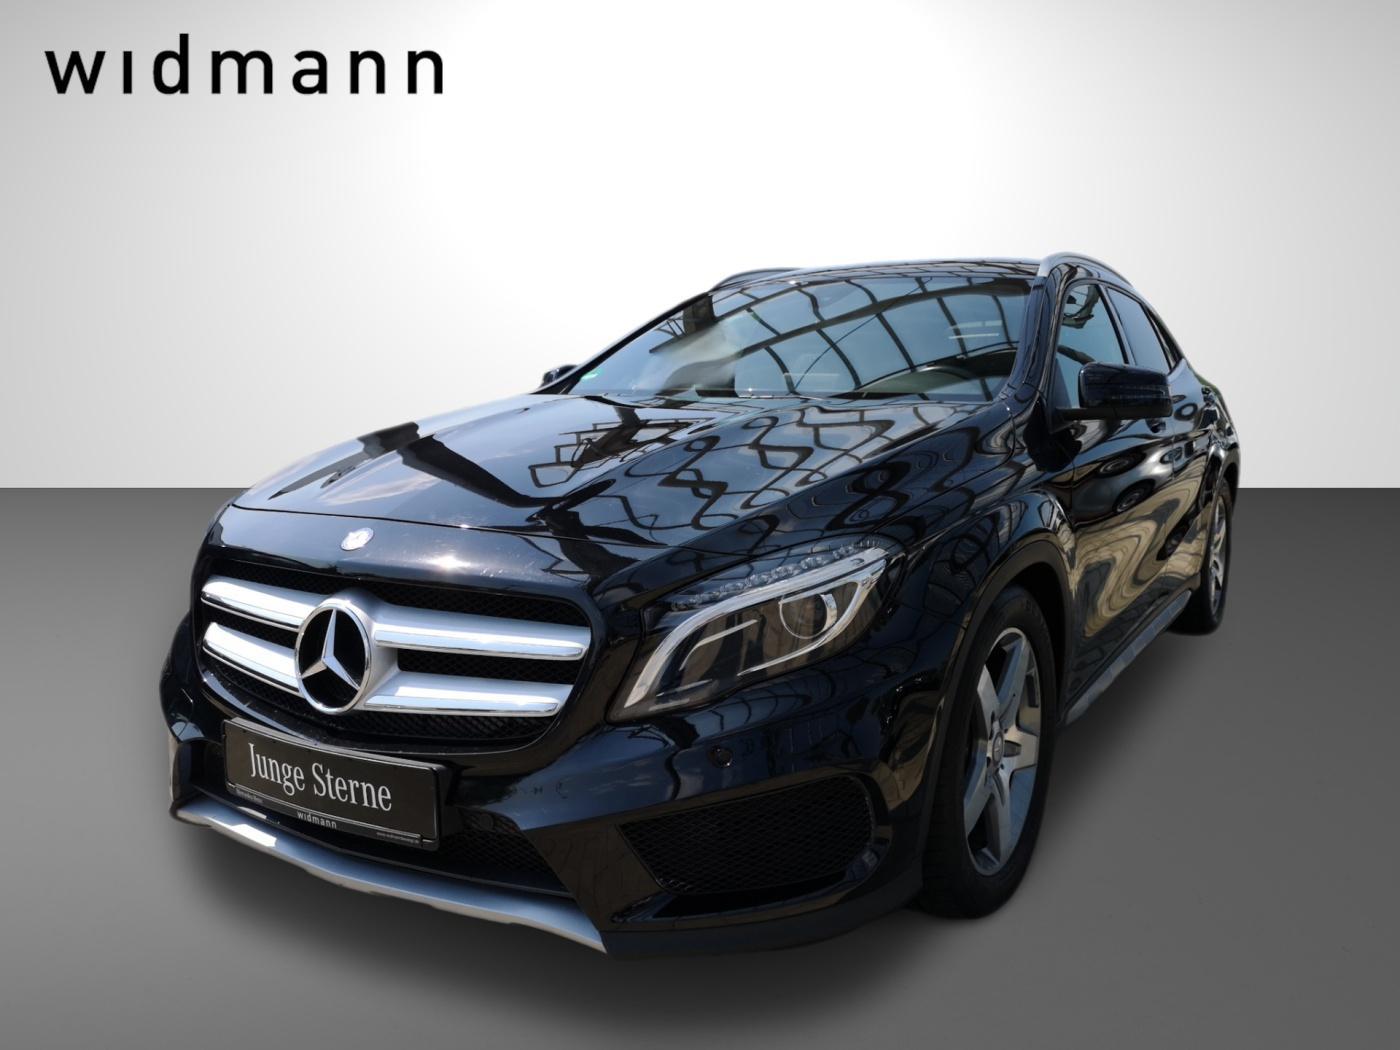 Mercedes-Benz GLA 250 4M *AMG*Kamera*Sitzhzg*7G-DCT*Park-Pilot, Jahr 2017, Benzin